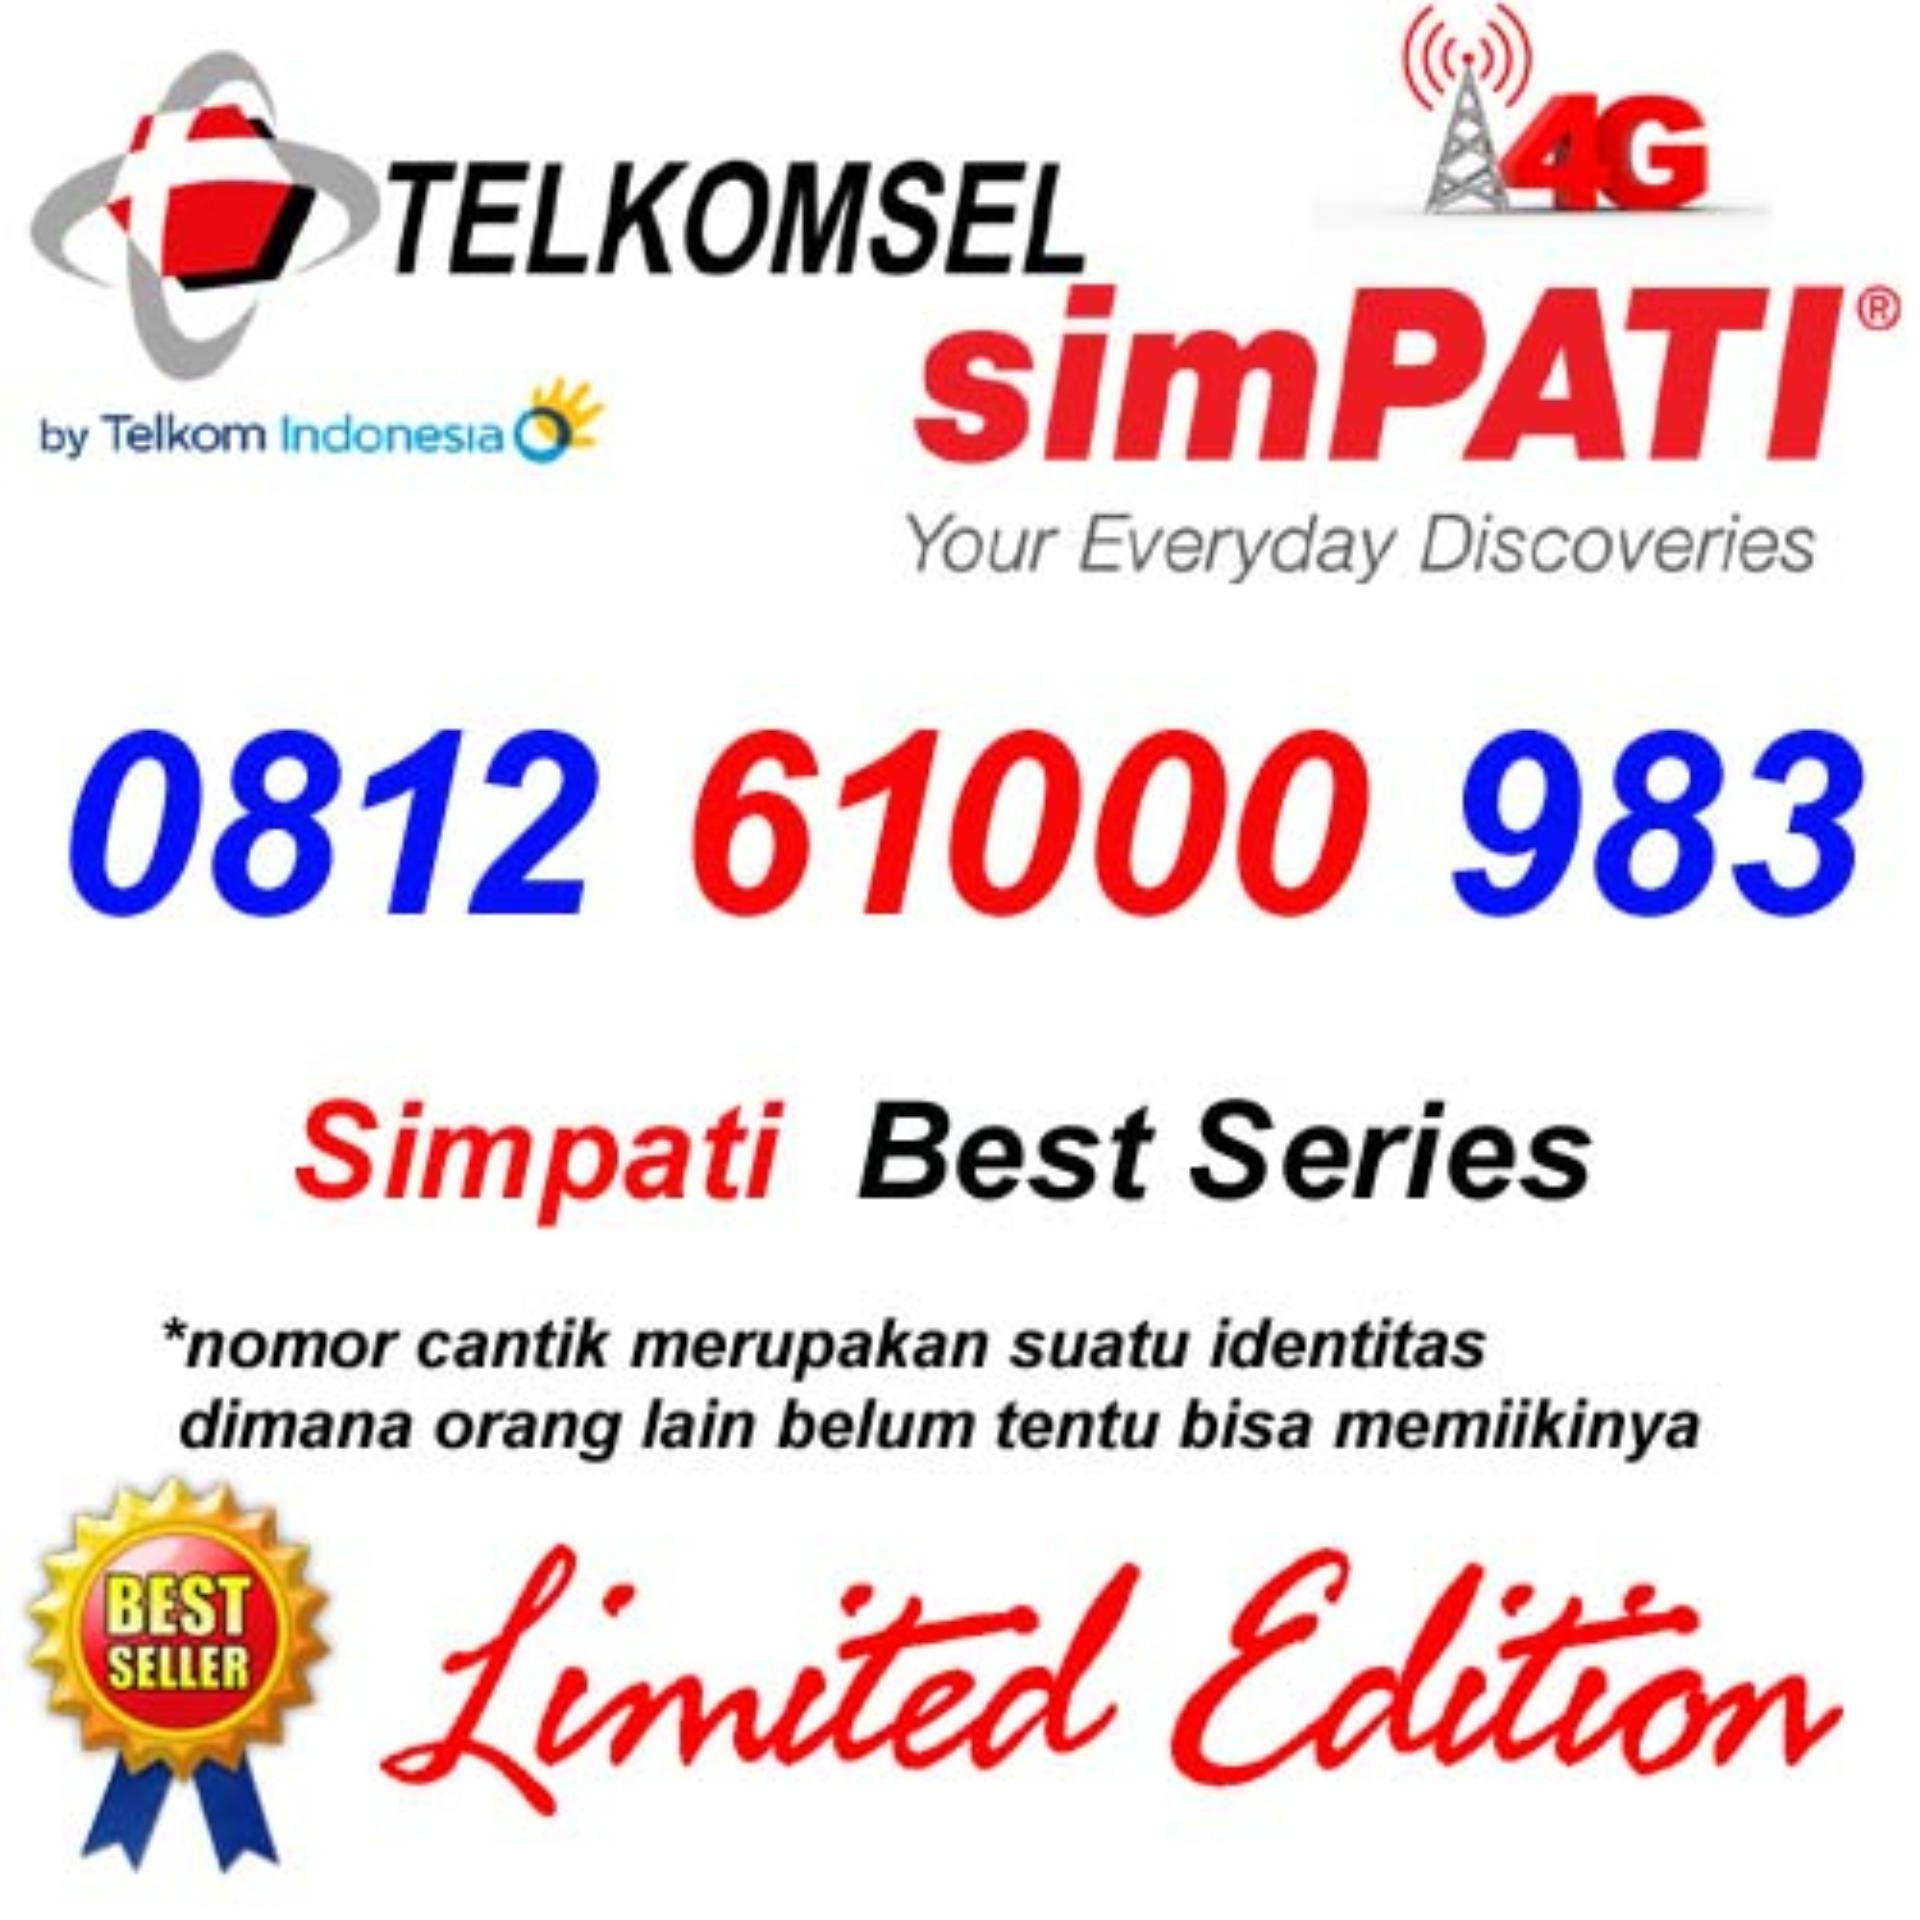 Telkomsel Simpati 4G Lte 0812 61000 983 Kartu Perdana Nomor Cantik